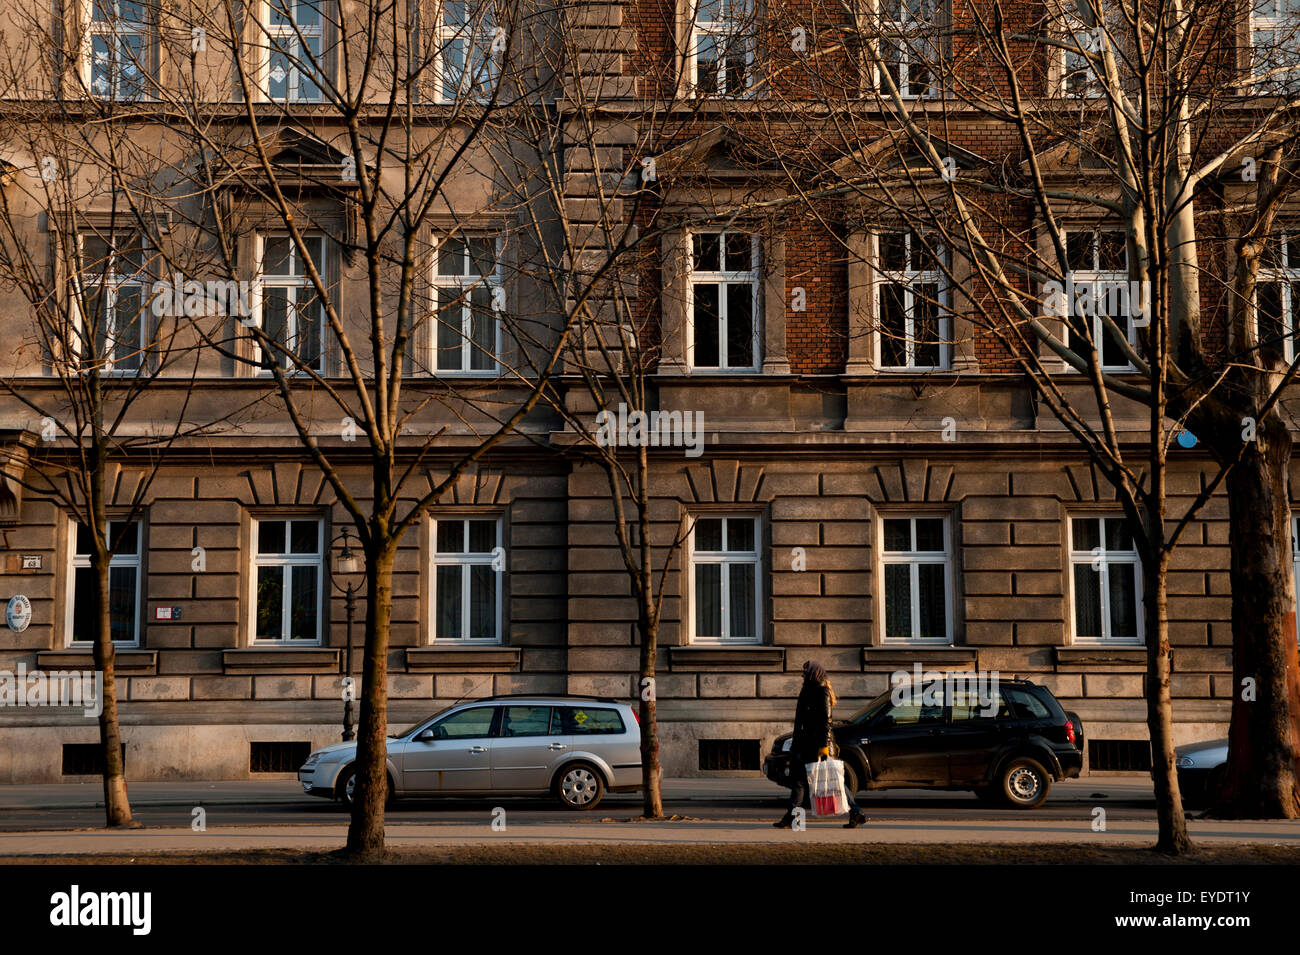 Buildings in Andrassy Ut, Budapest, Hungary - Stock Image